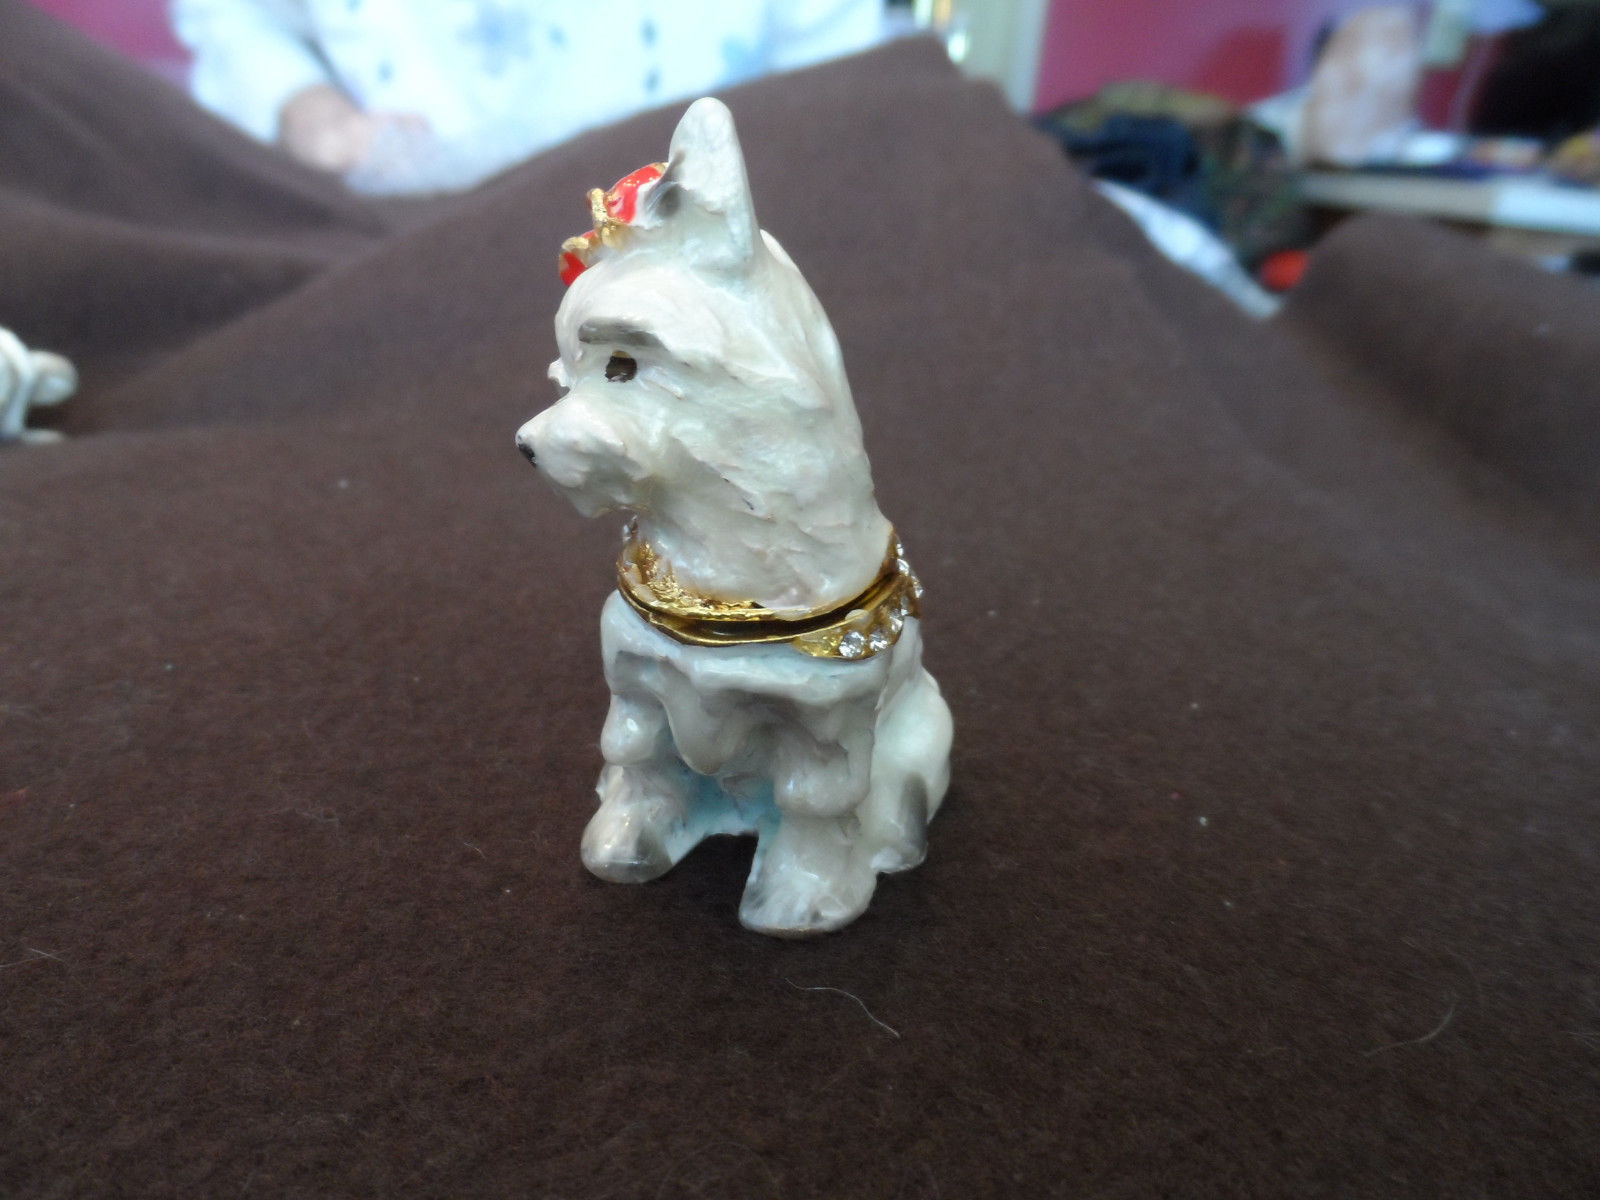 New metal hinged, jeweled trinket box - choice image 10